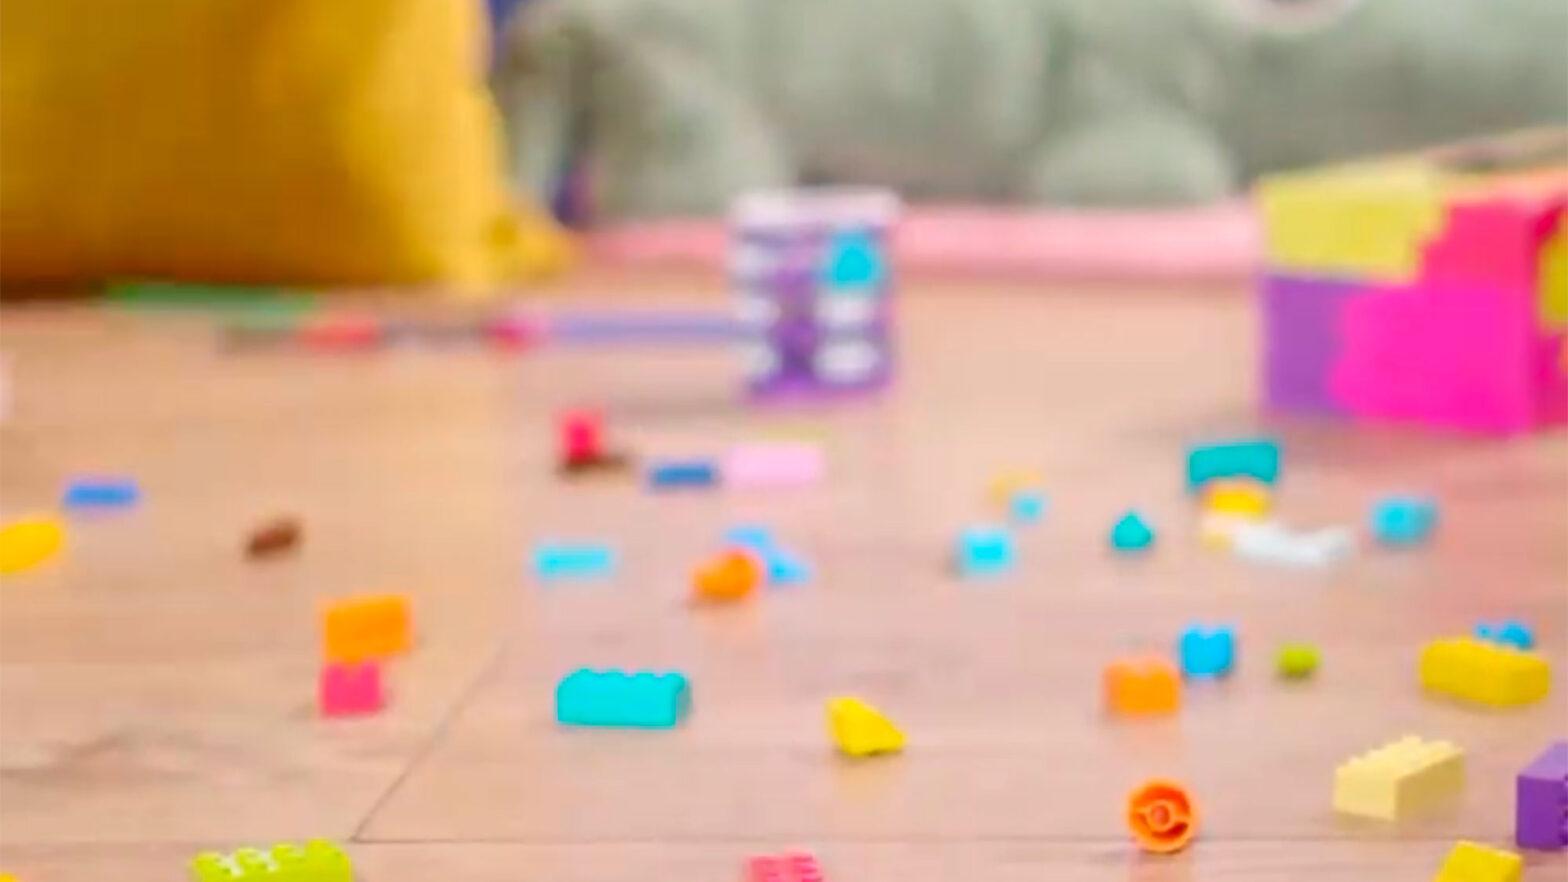 LEGO SmartBricks April's Fool Prank